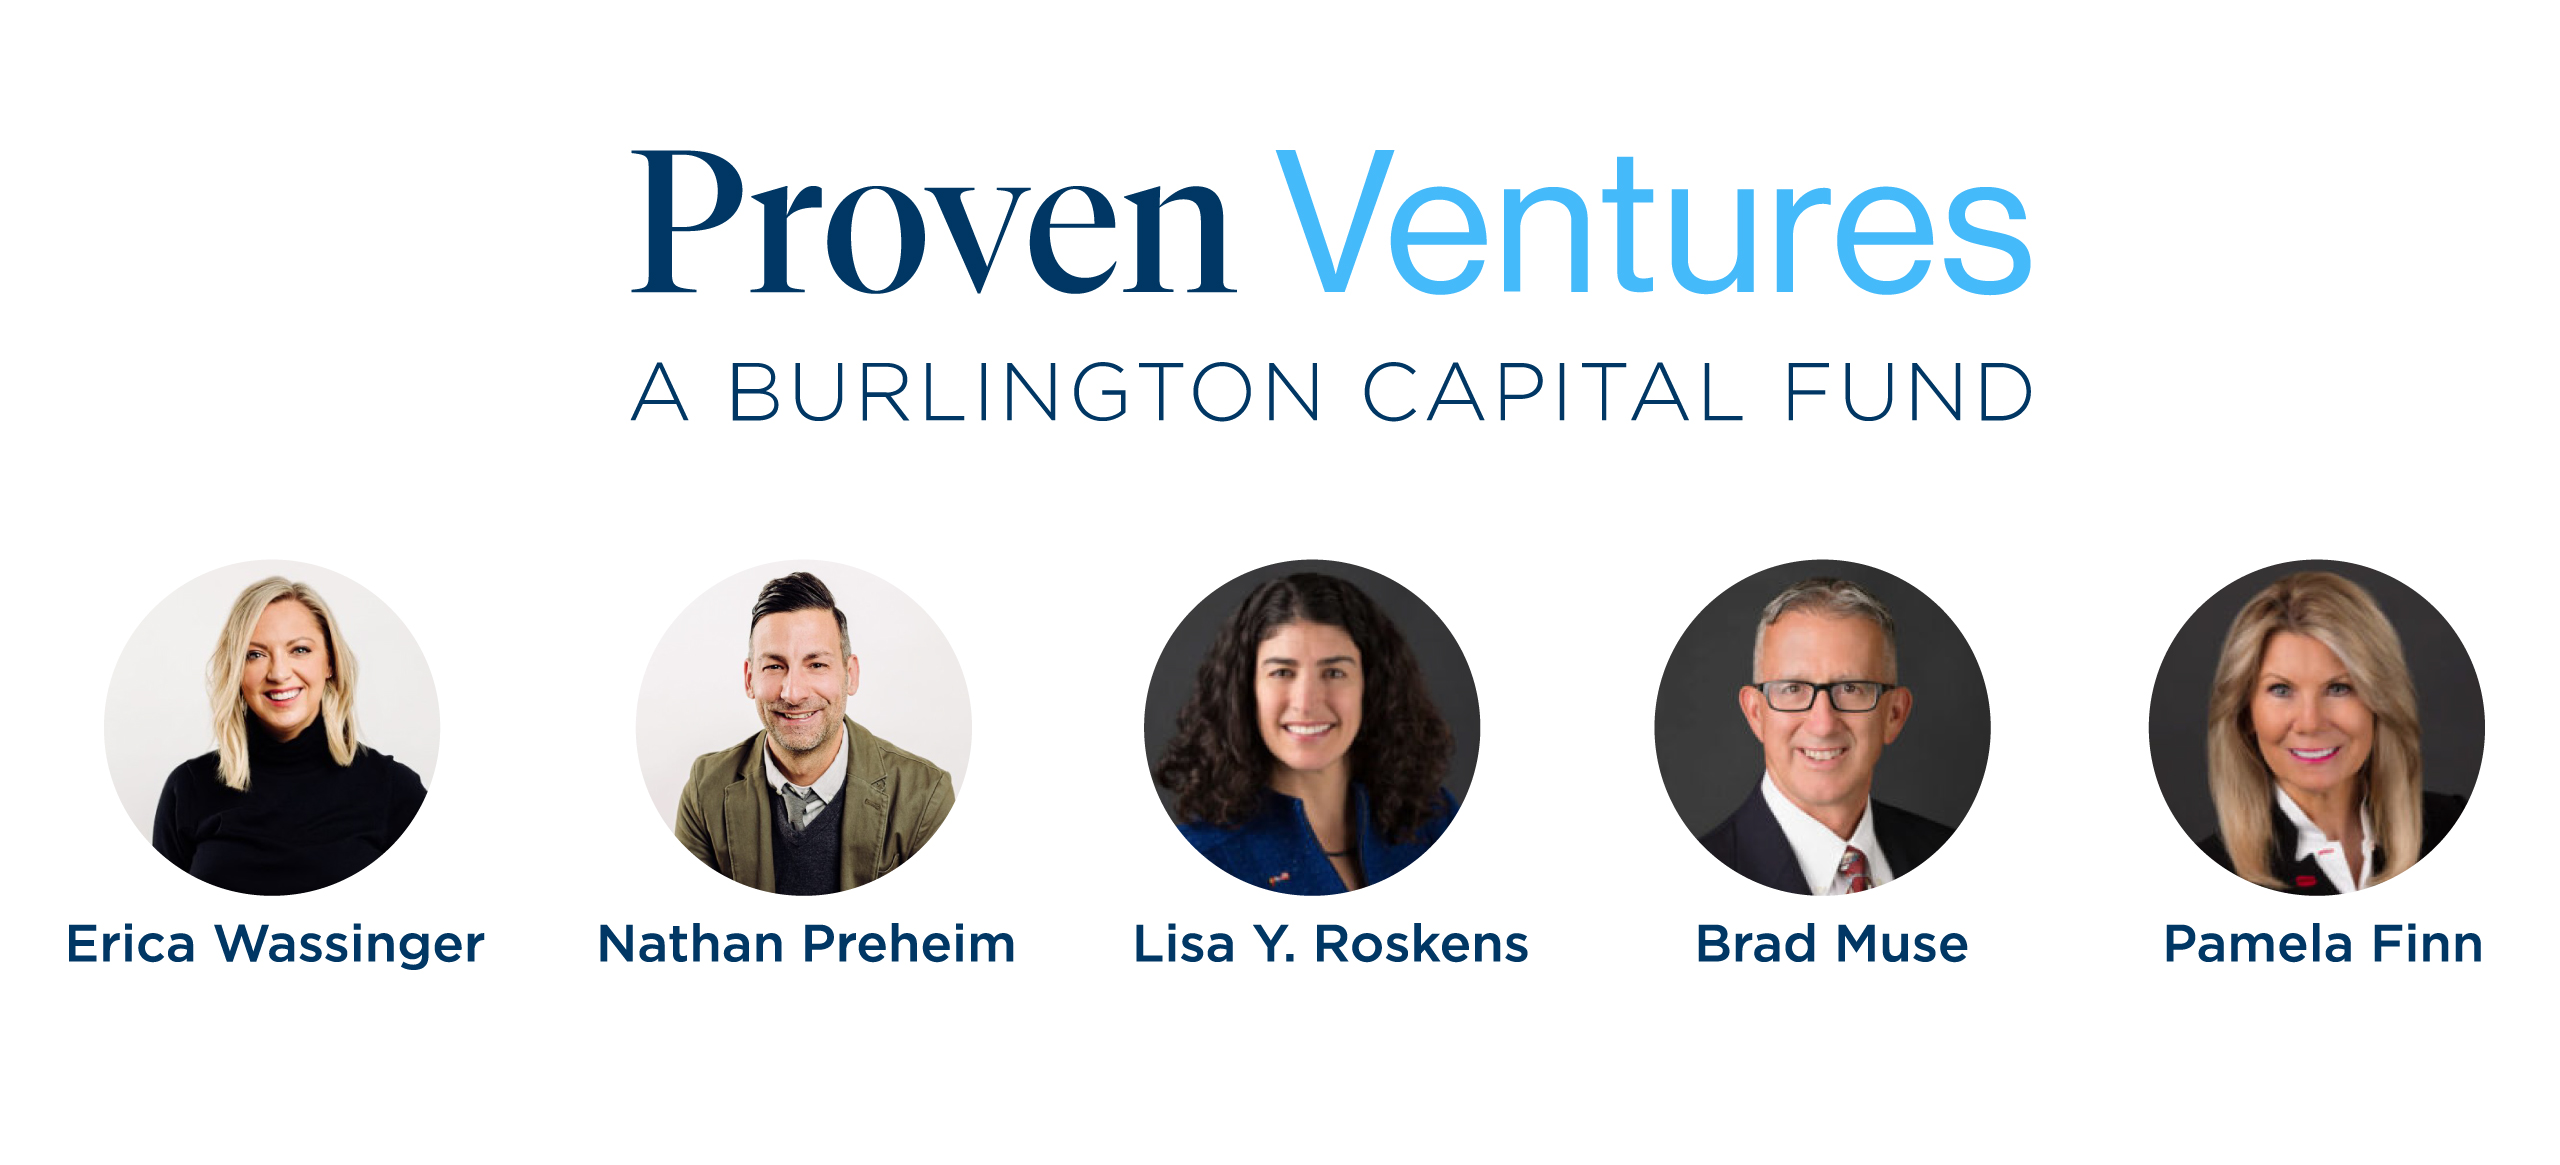 Proven Ventures joins Burlington Capital family of funds